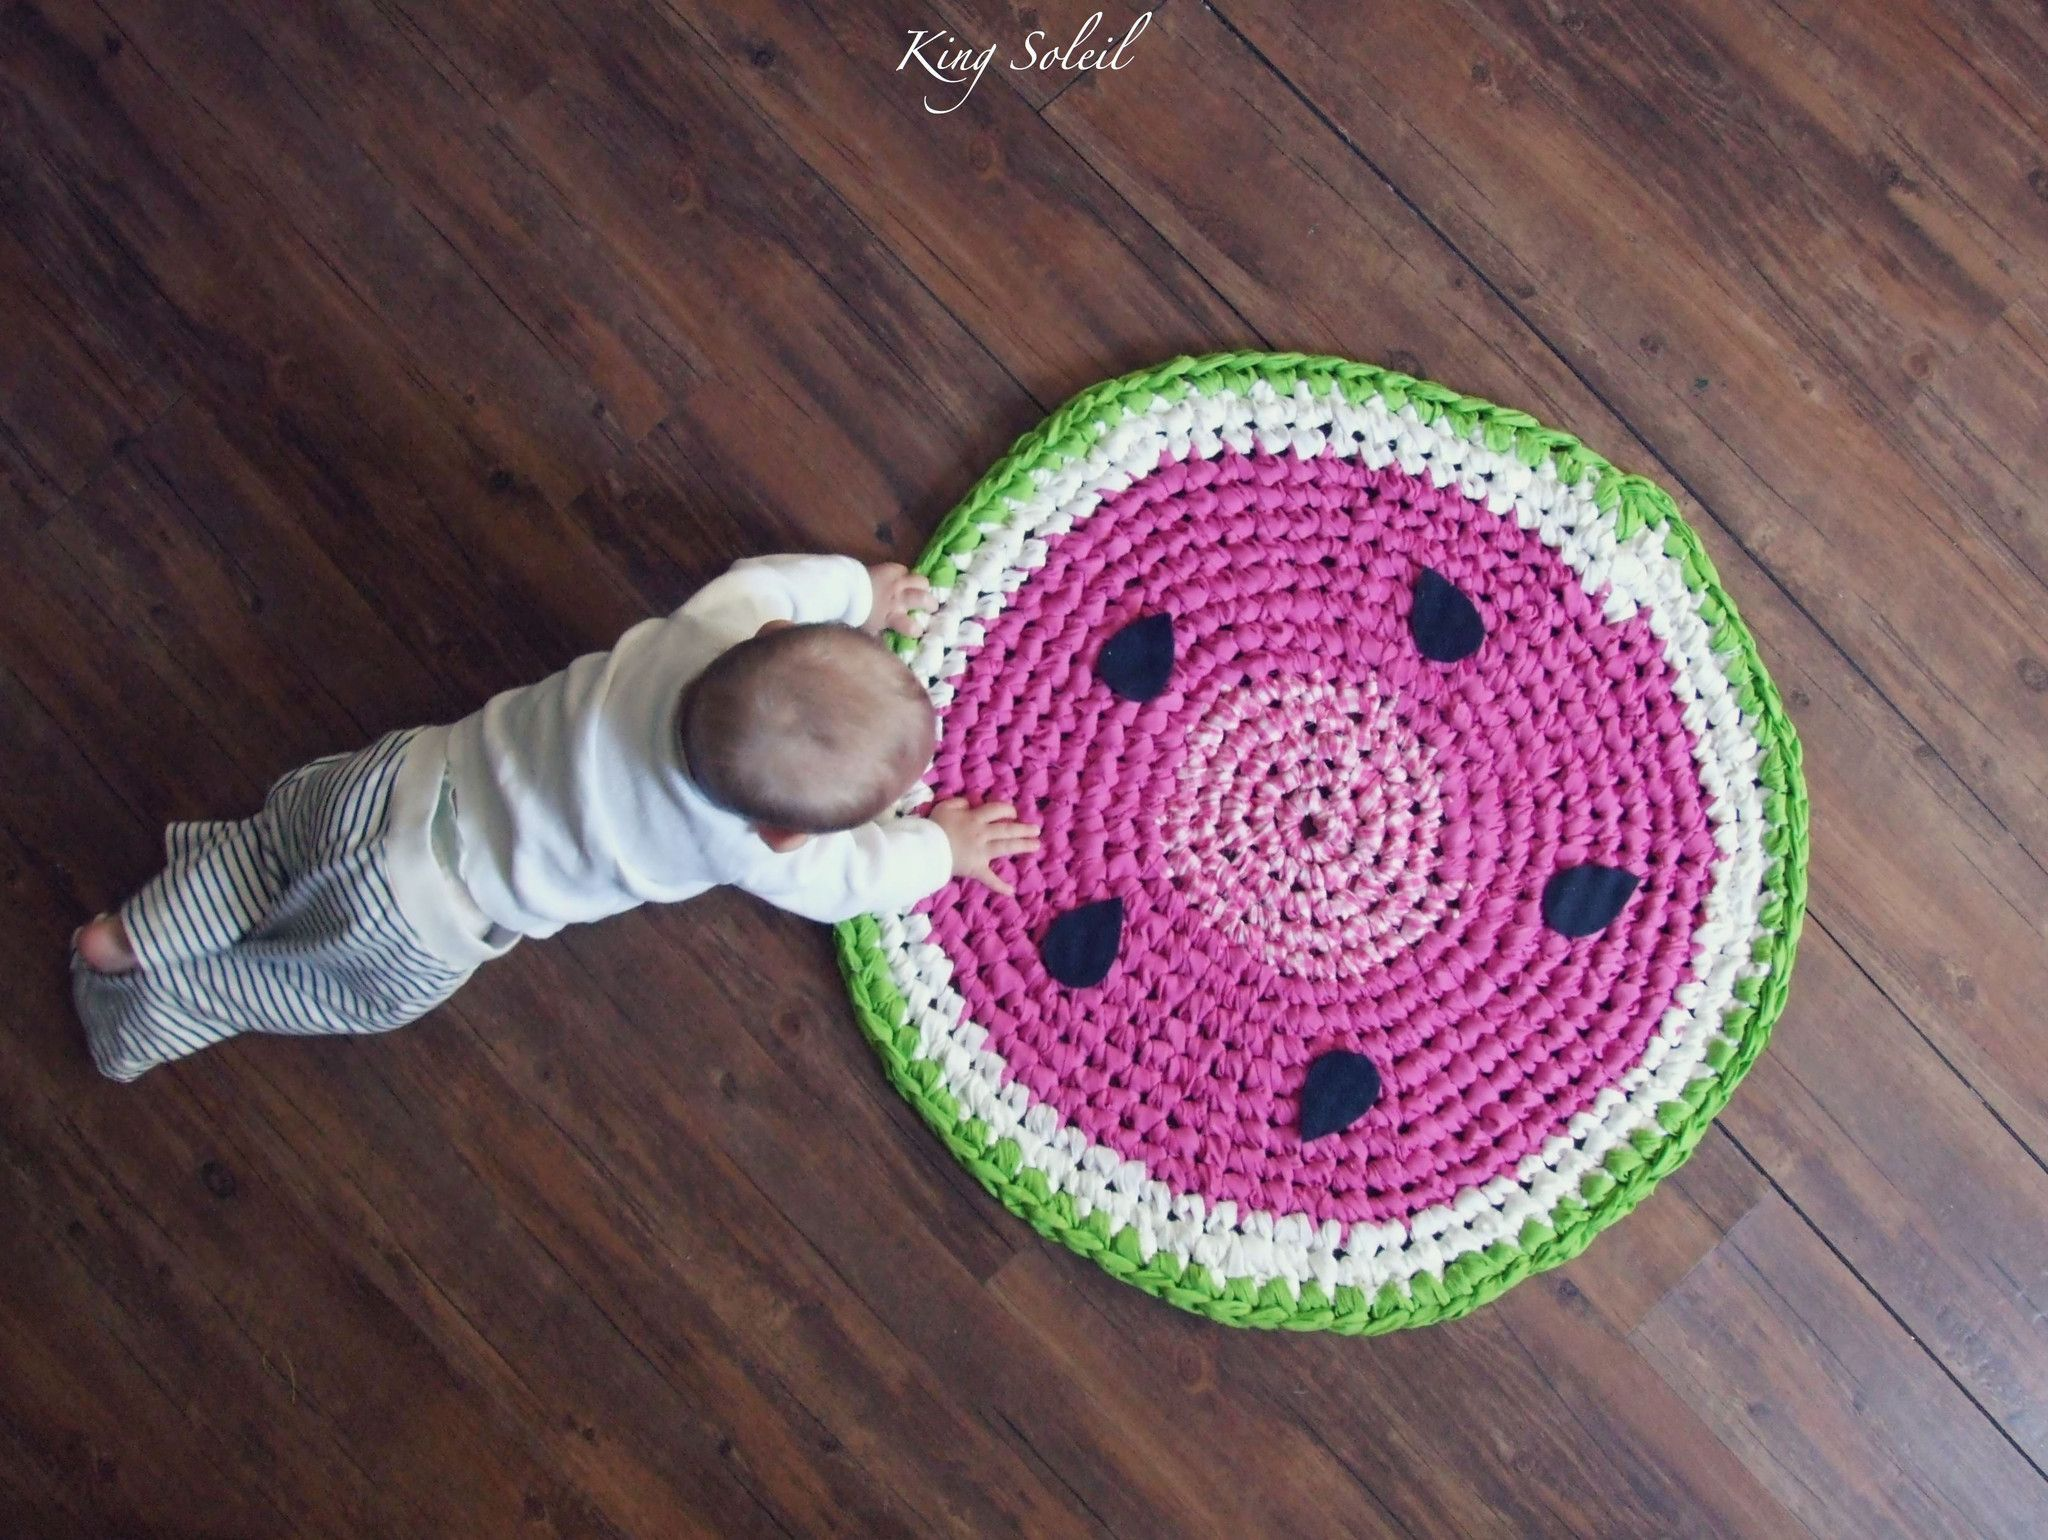 Crochet Watermelon Rug This Hand